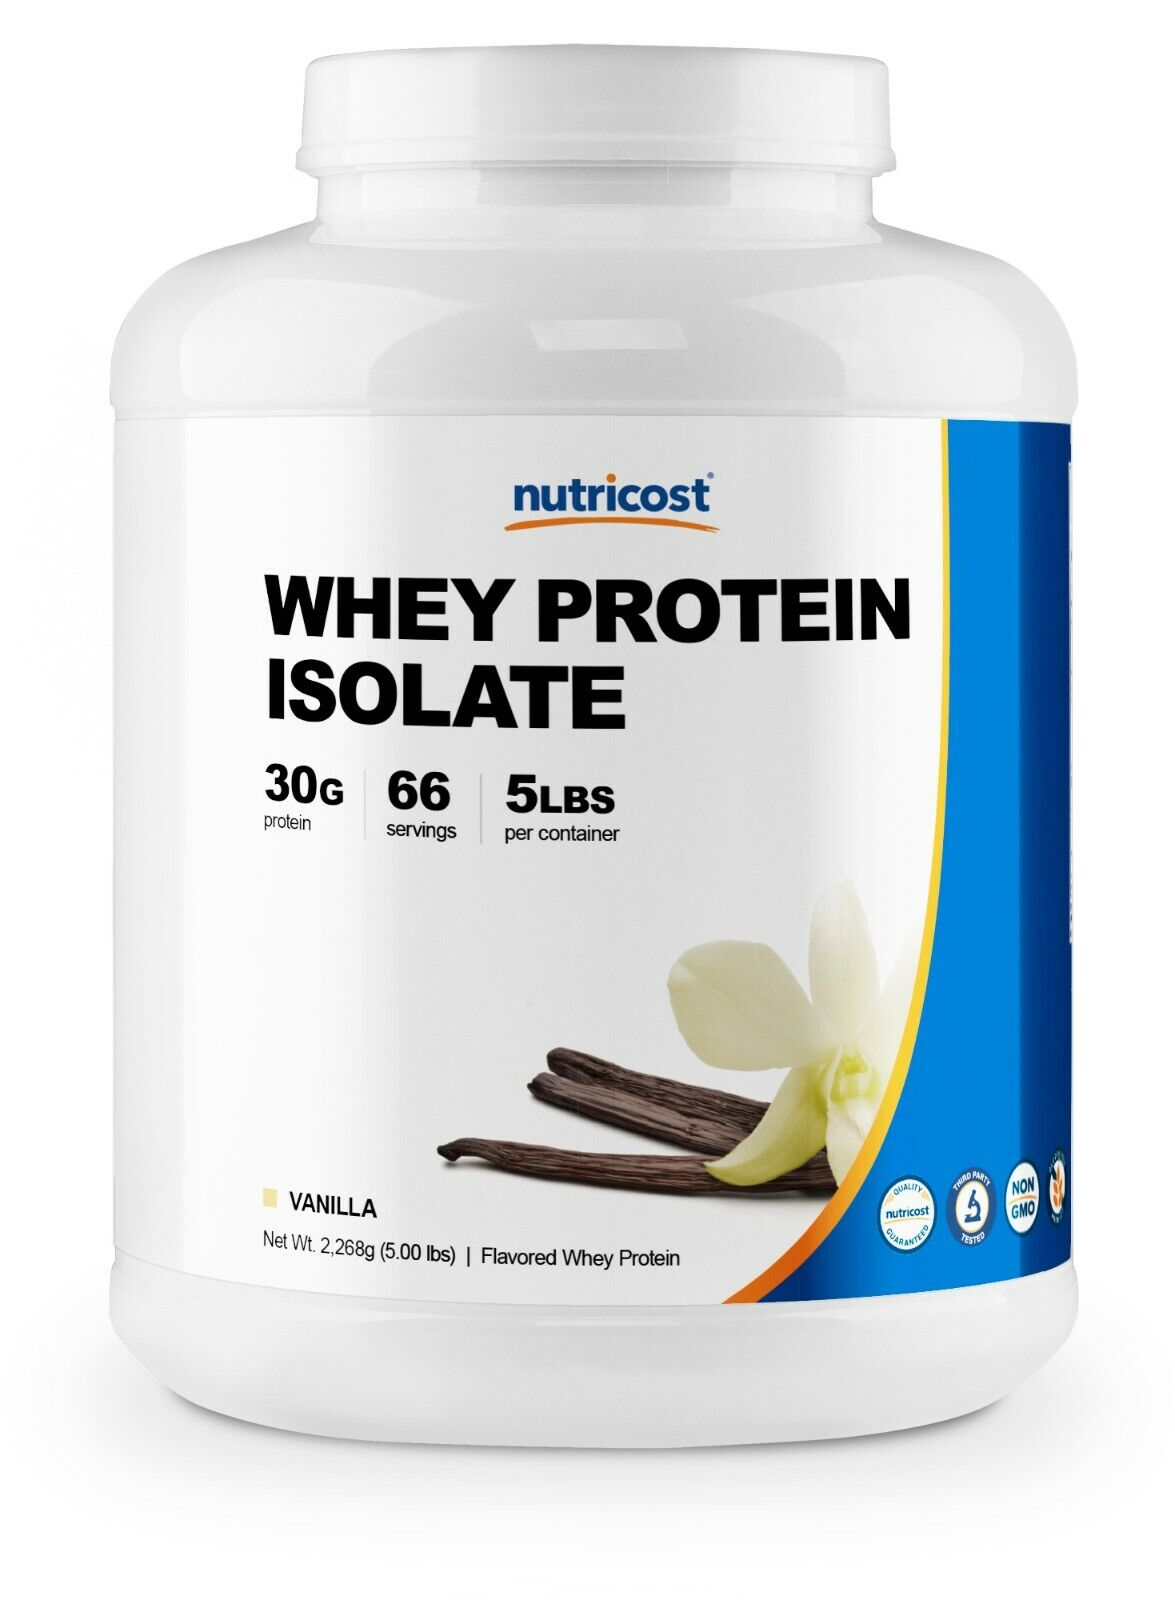 Nutricost Whey Protein Isolate (Vanilla) 5LBS - Premium Isolate Protein Powder